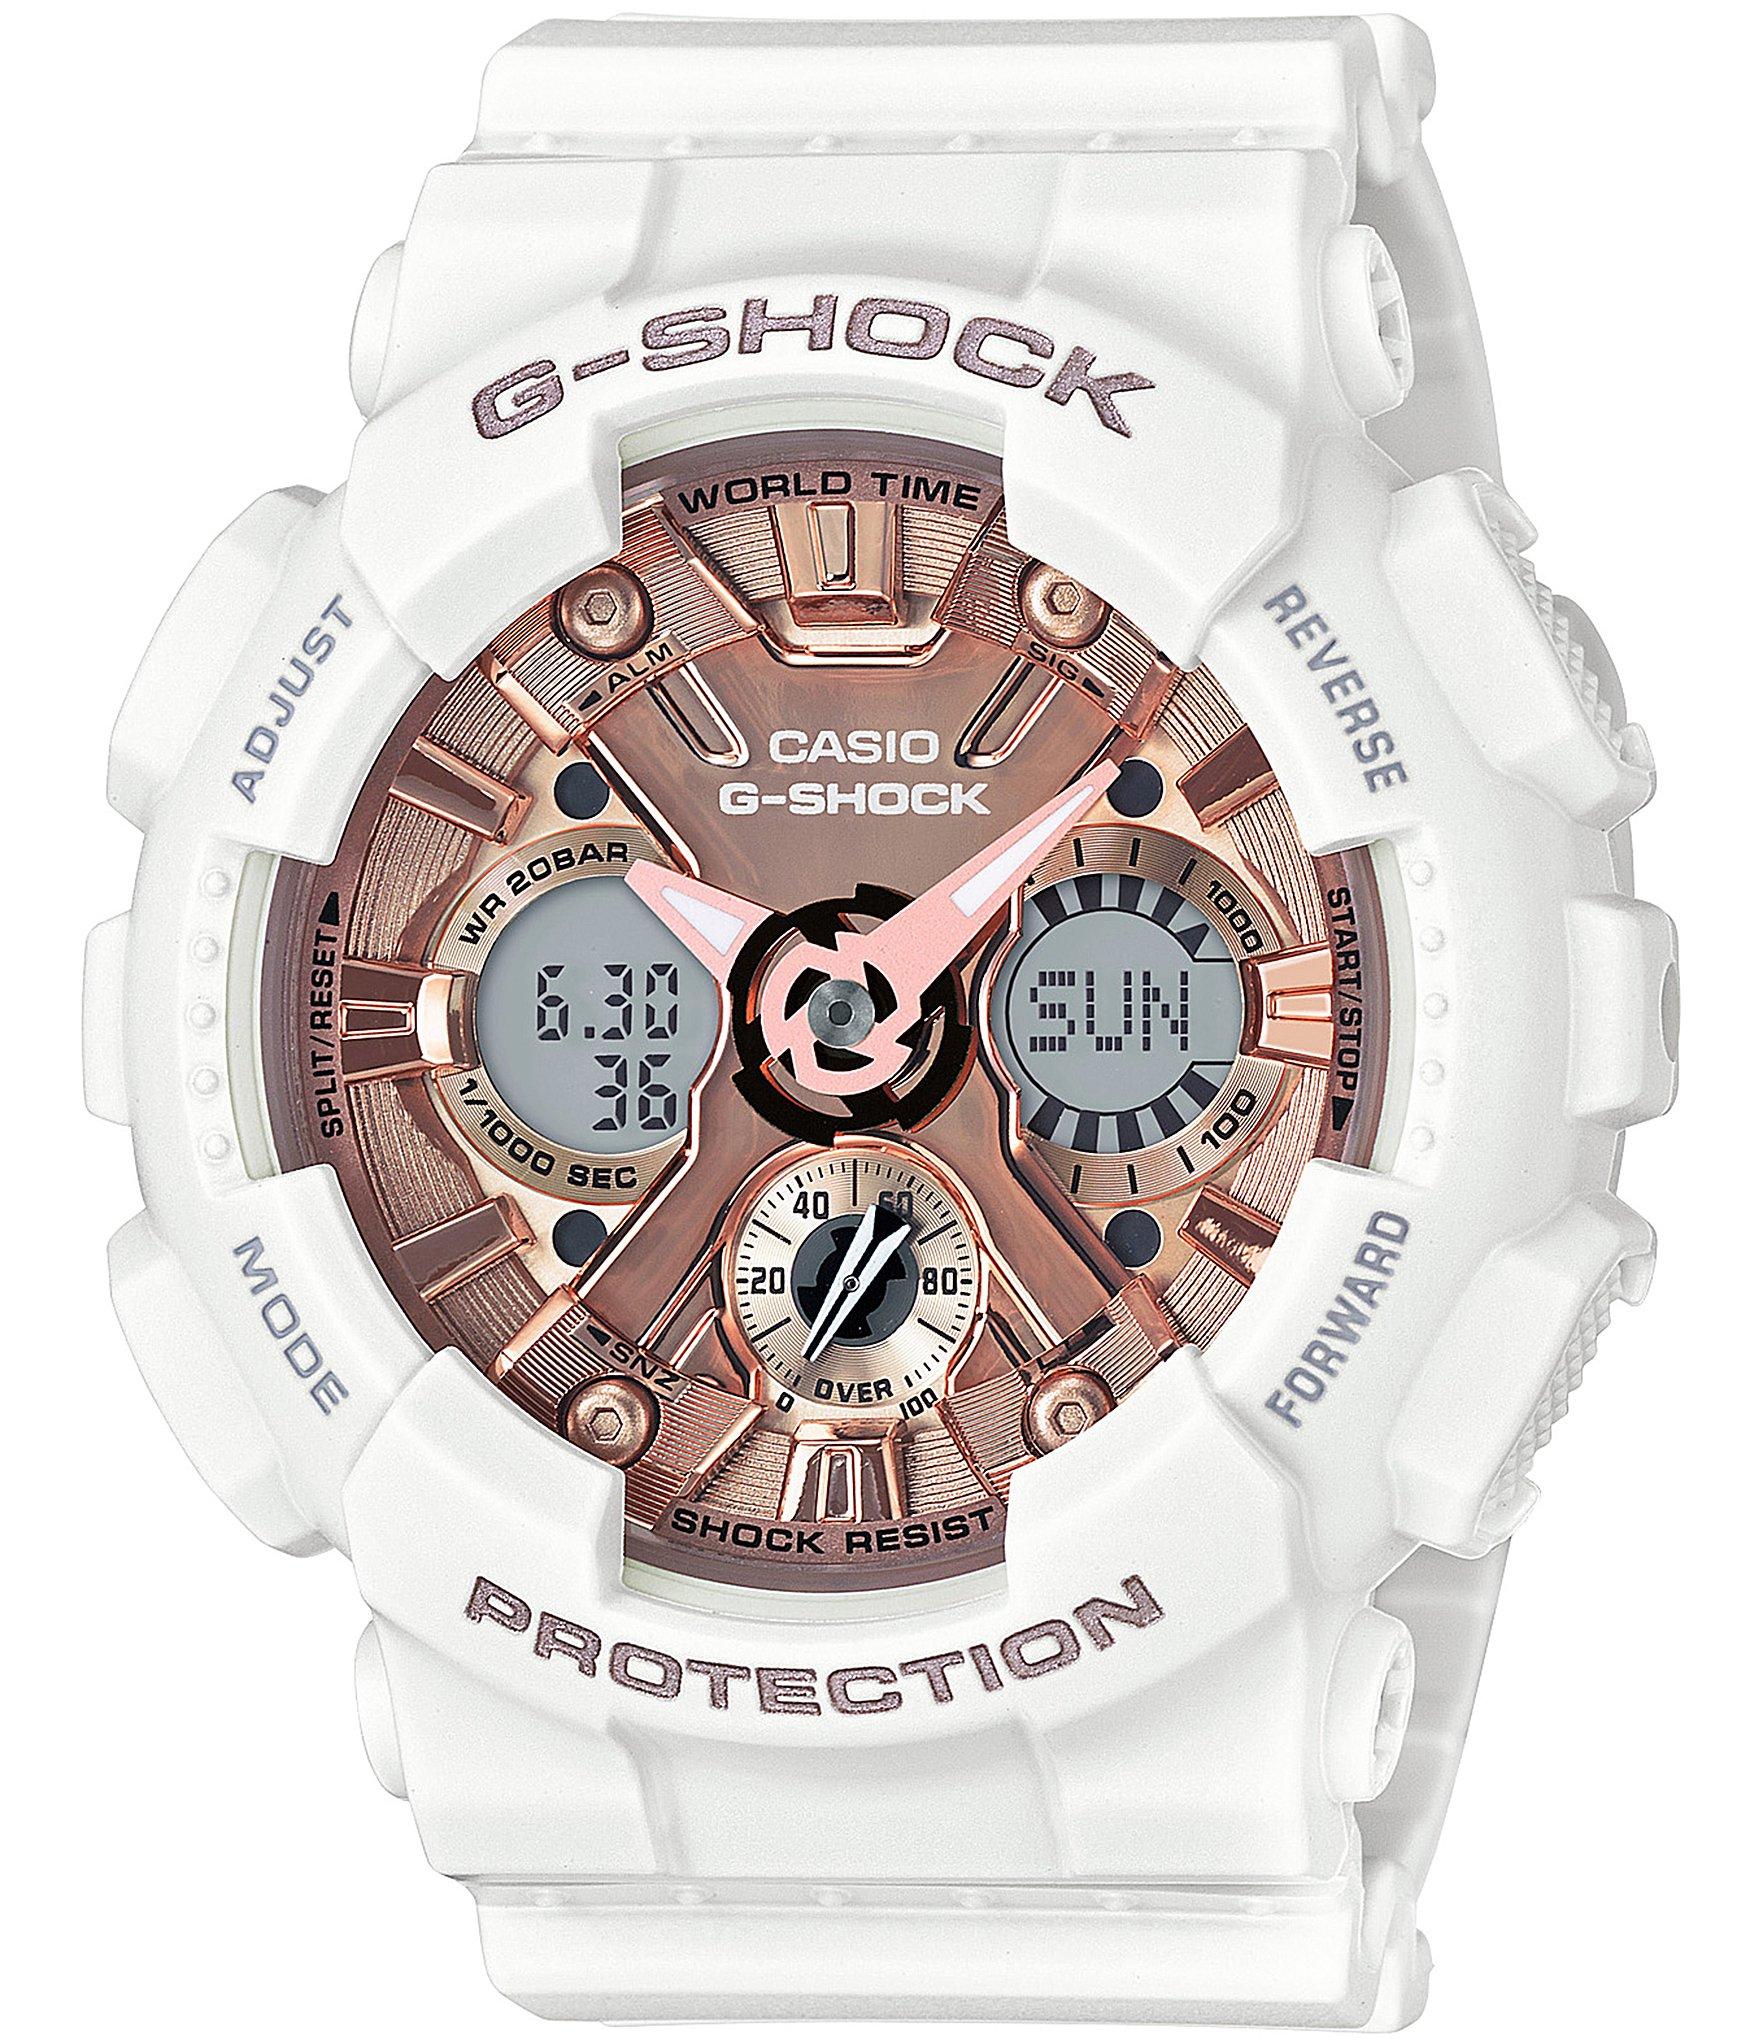 1dba0212a5 G-Shock Resin-Strap Ana-Digi Watch